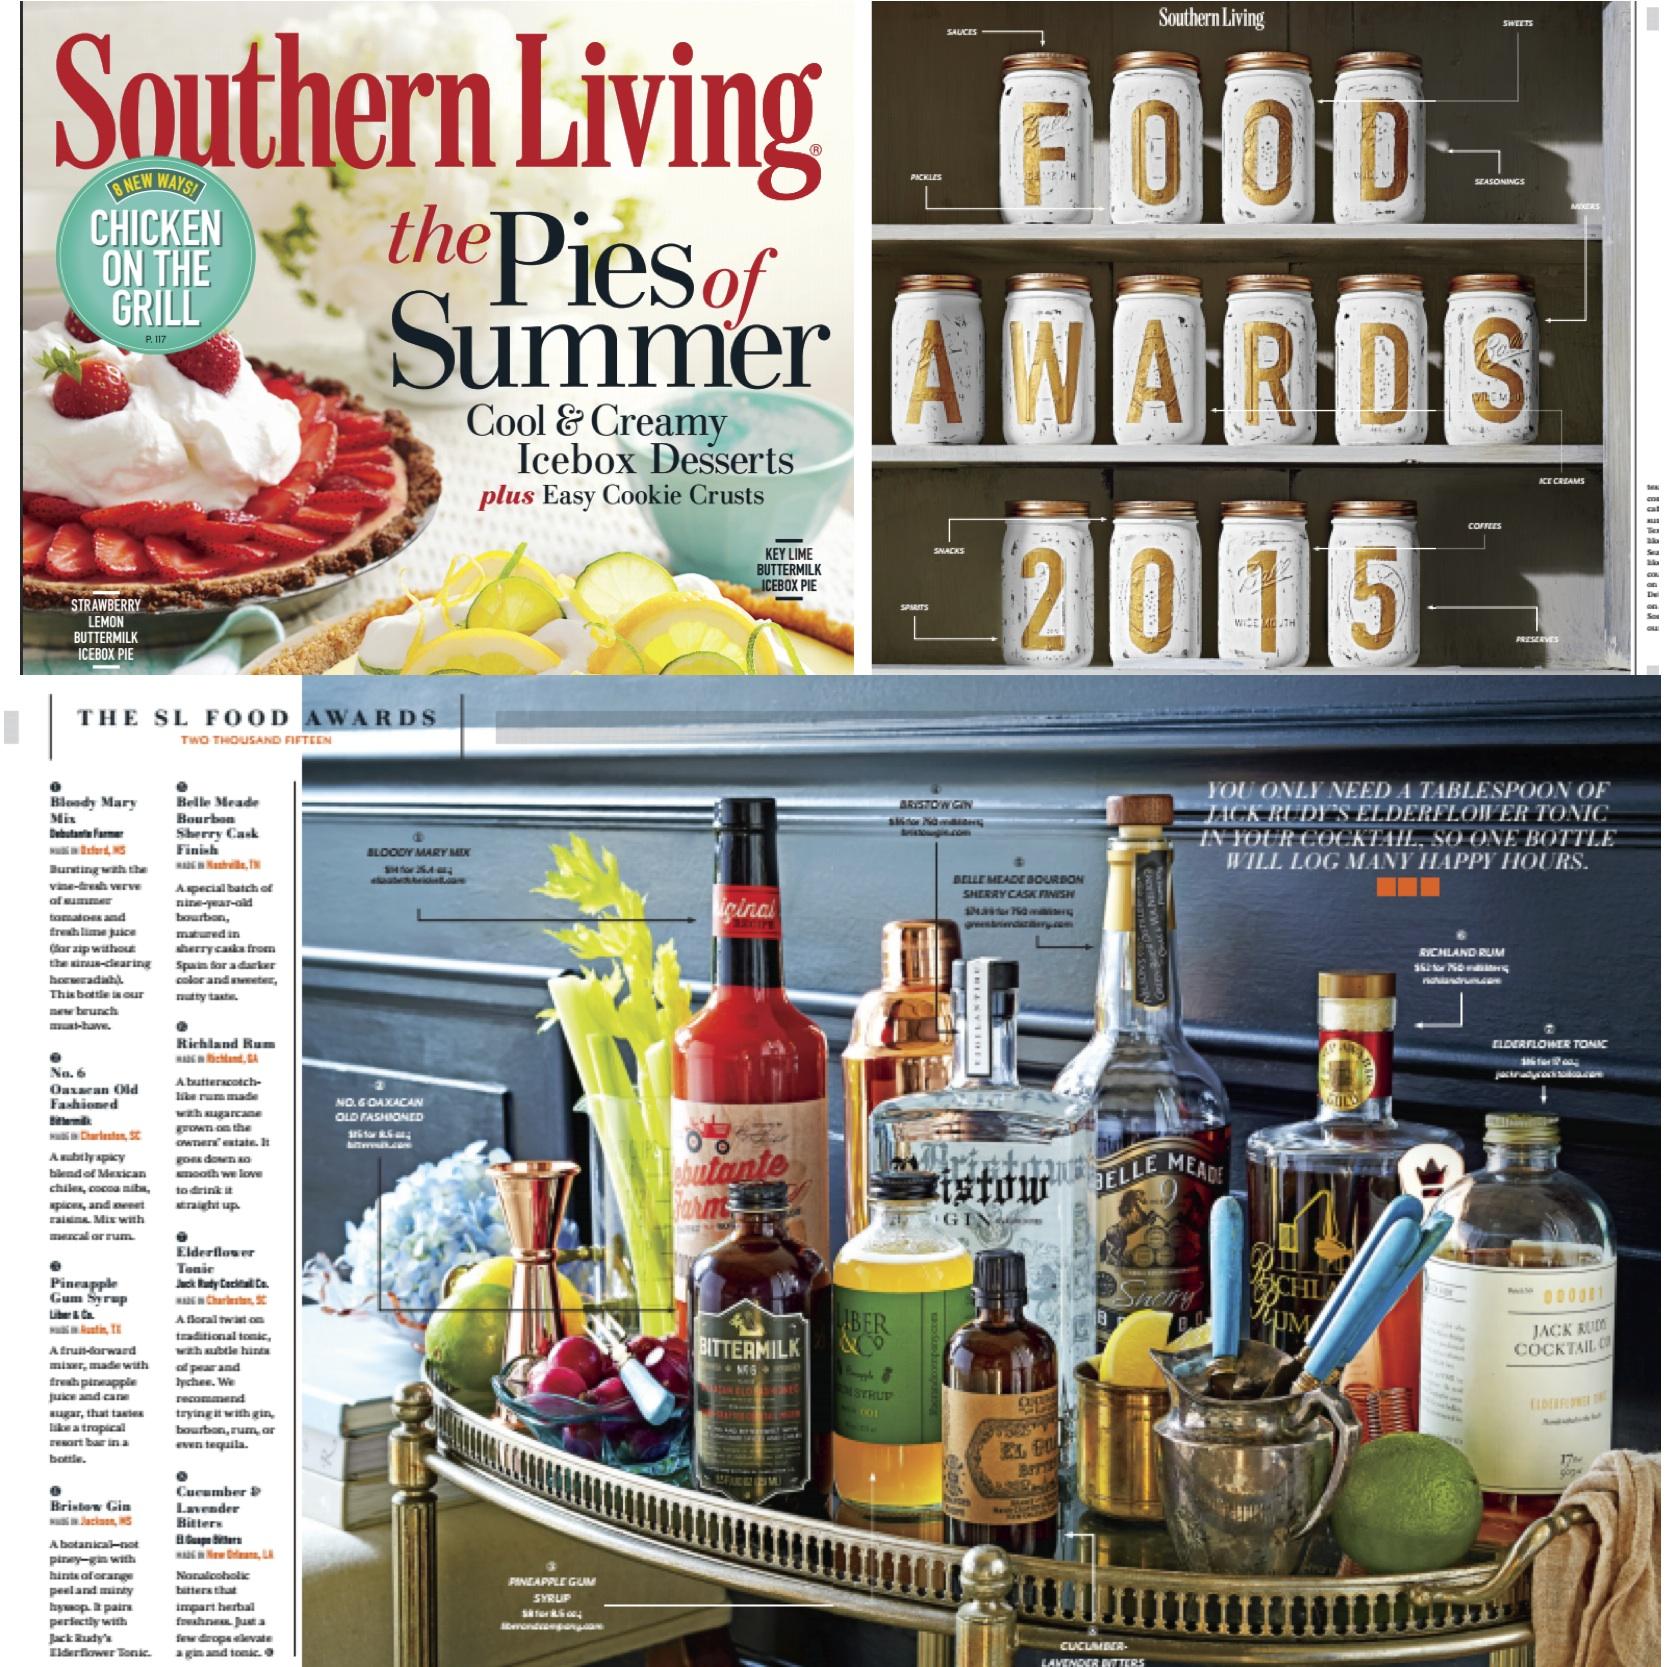 Belle Meade Bourbon wins 2015 Southern Living Food Award